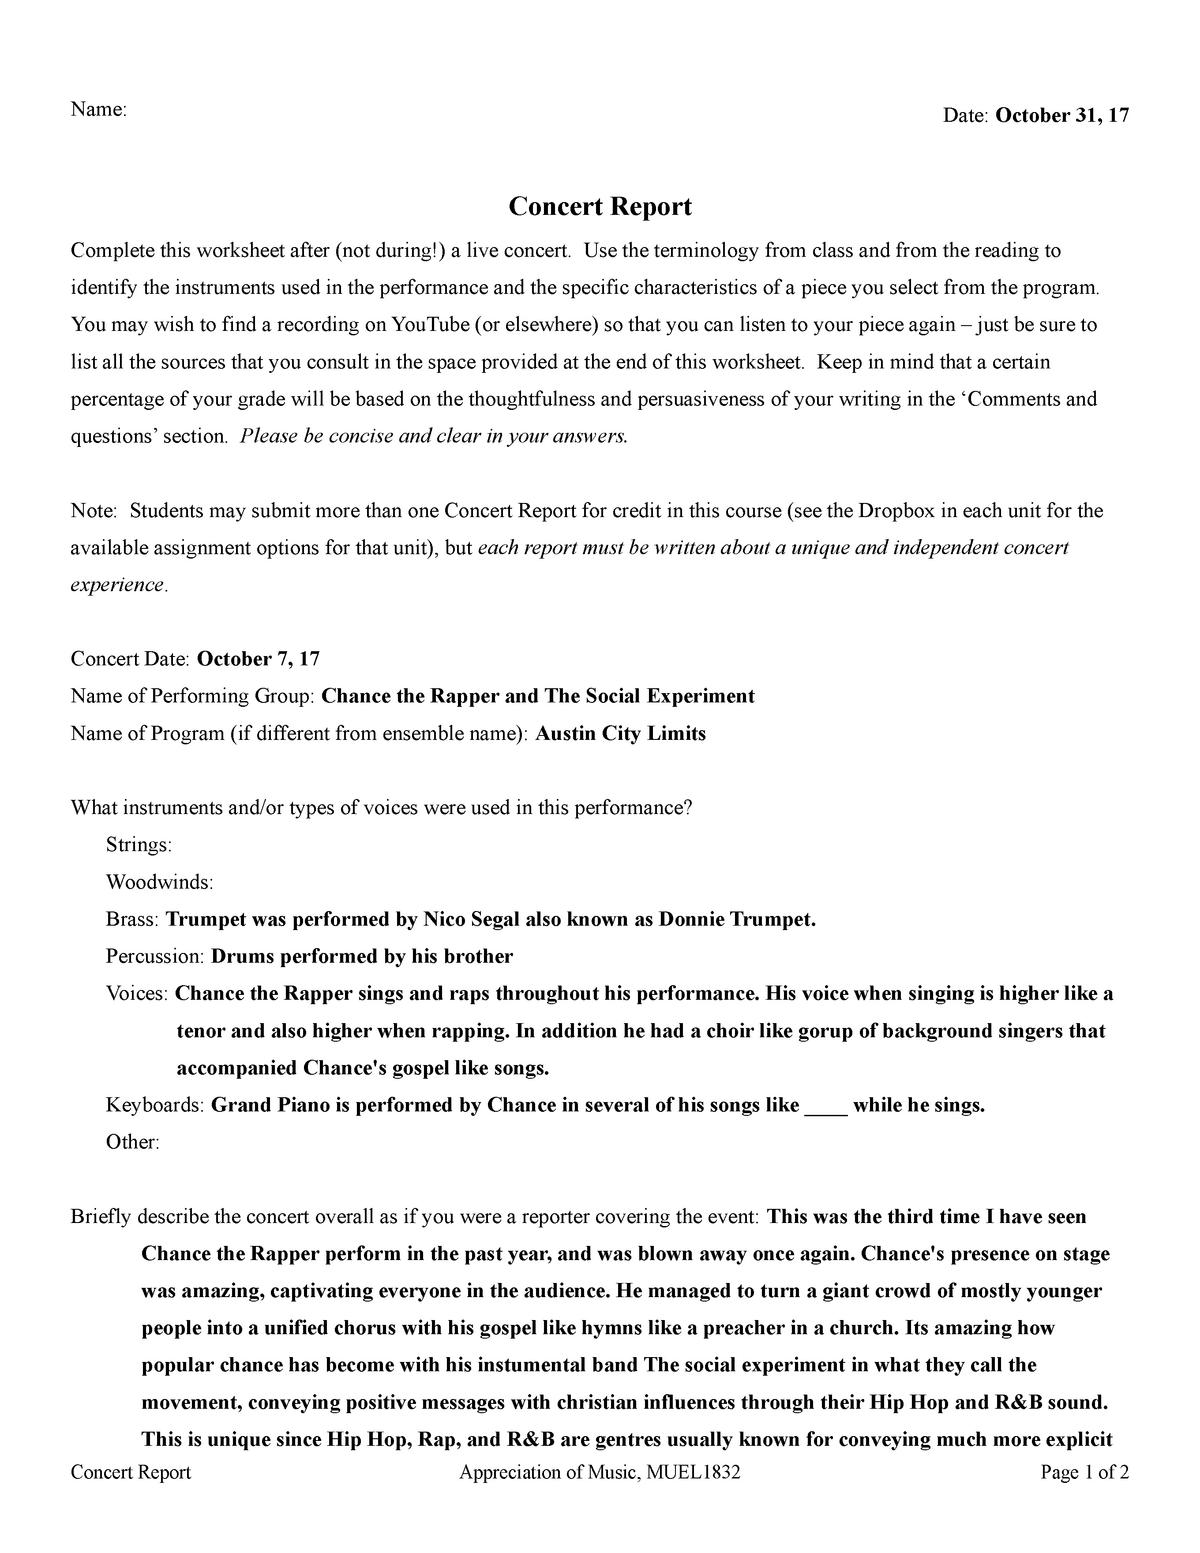 Homework Help With Music Concert Report